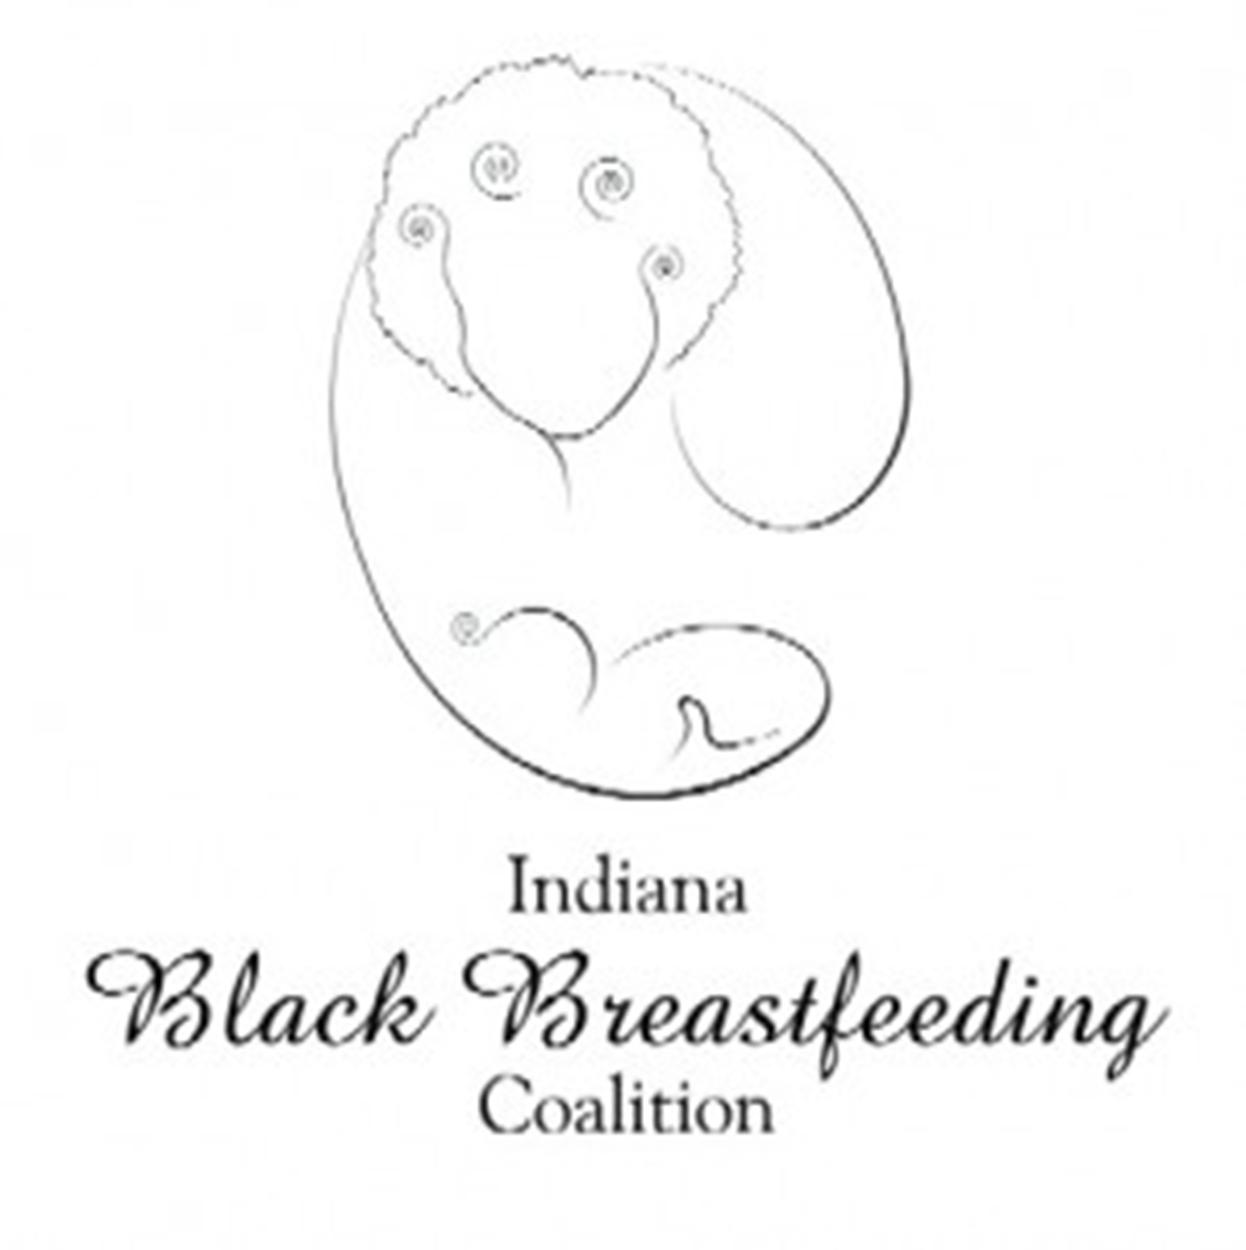 Indiana Black breastfeeding Coalition.jpg